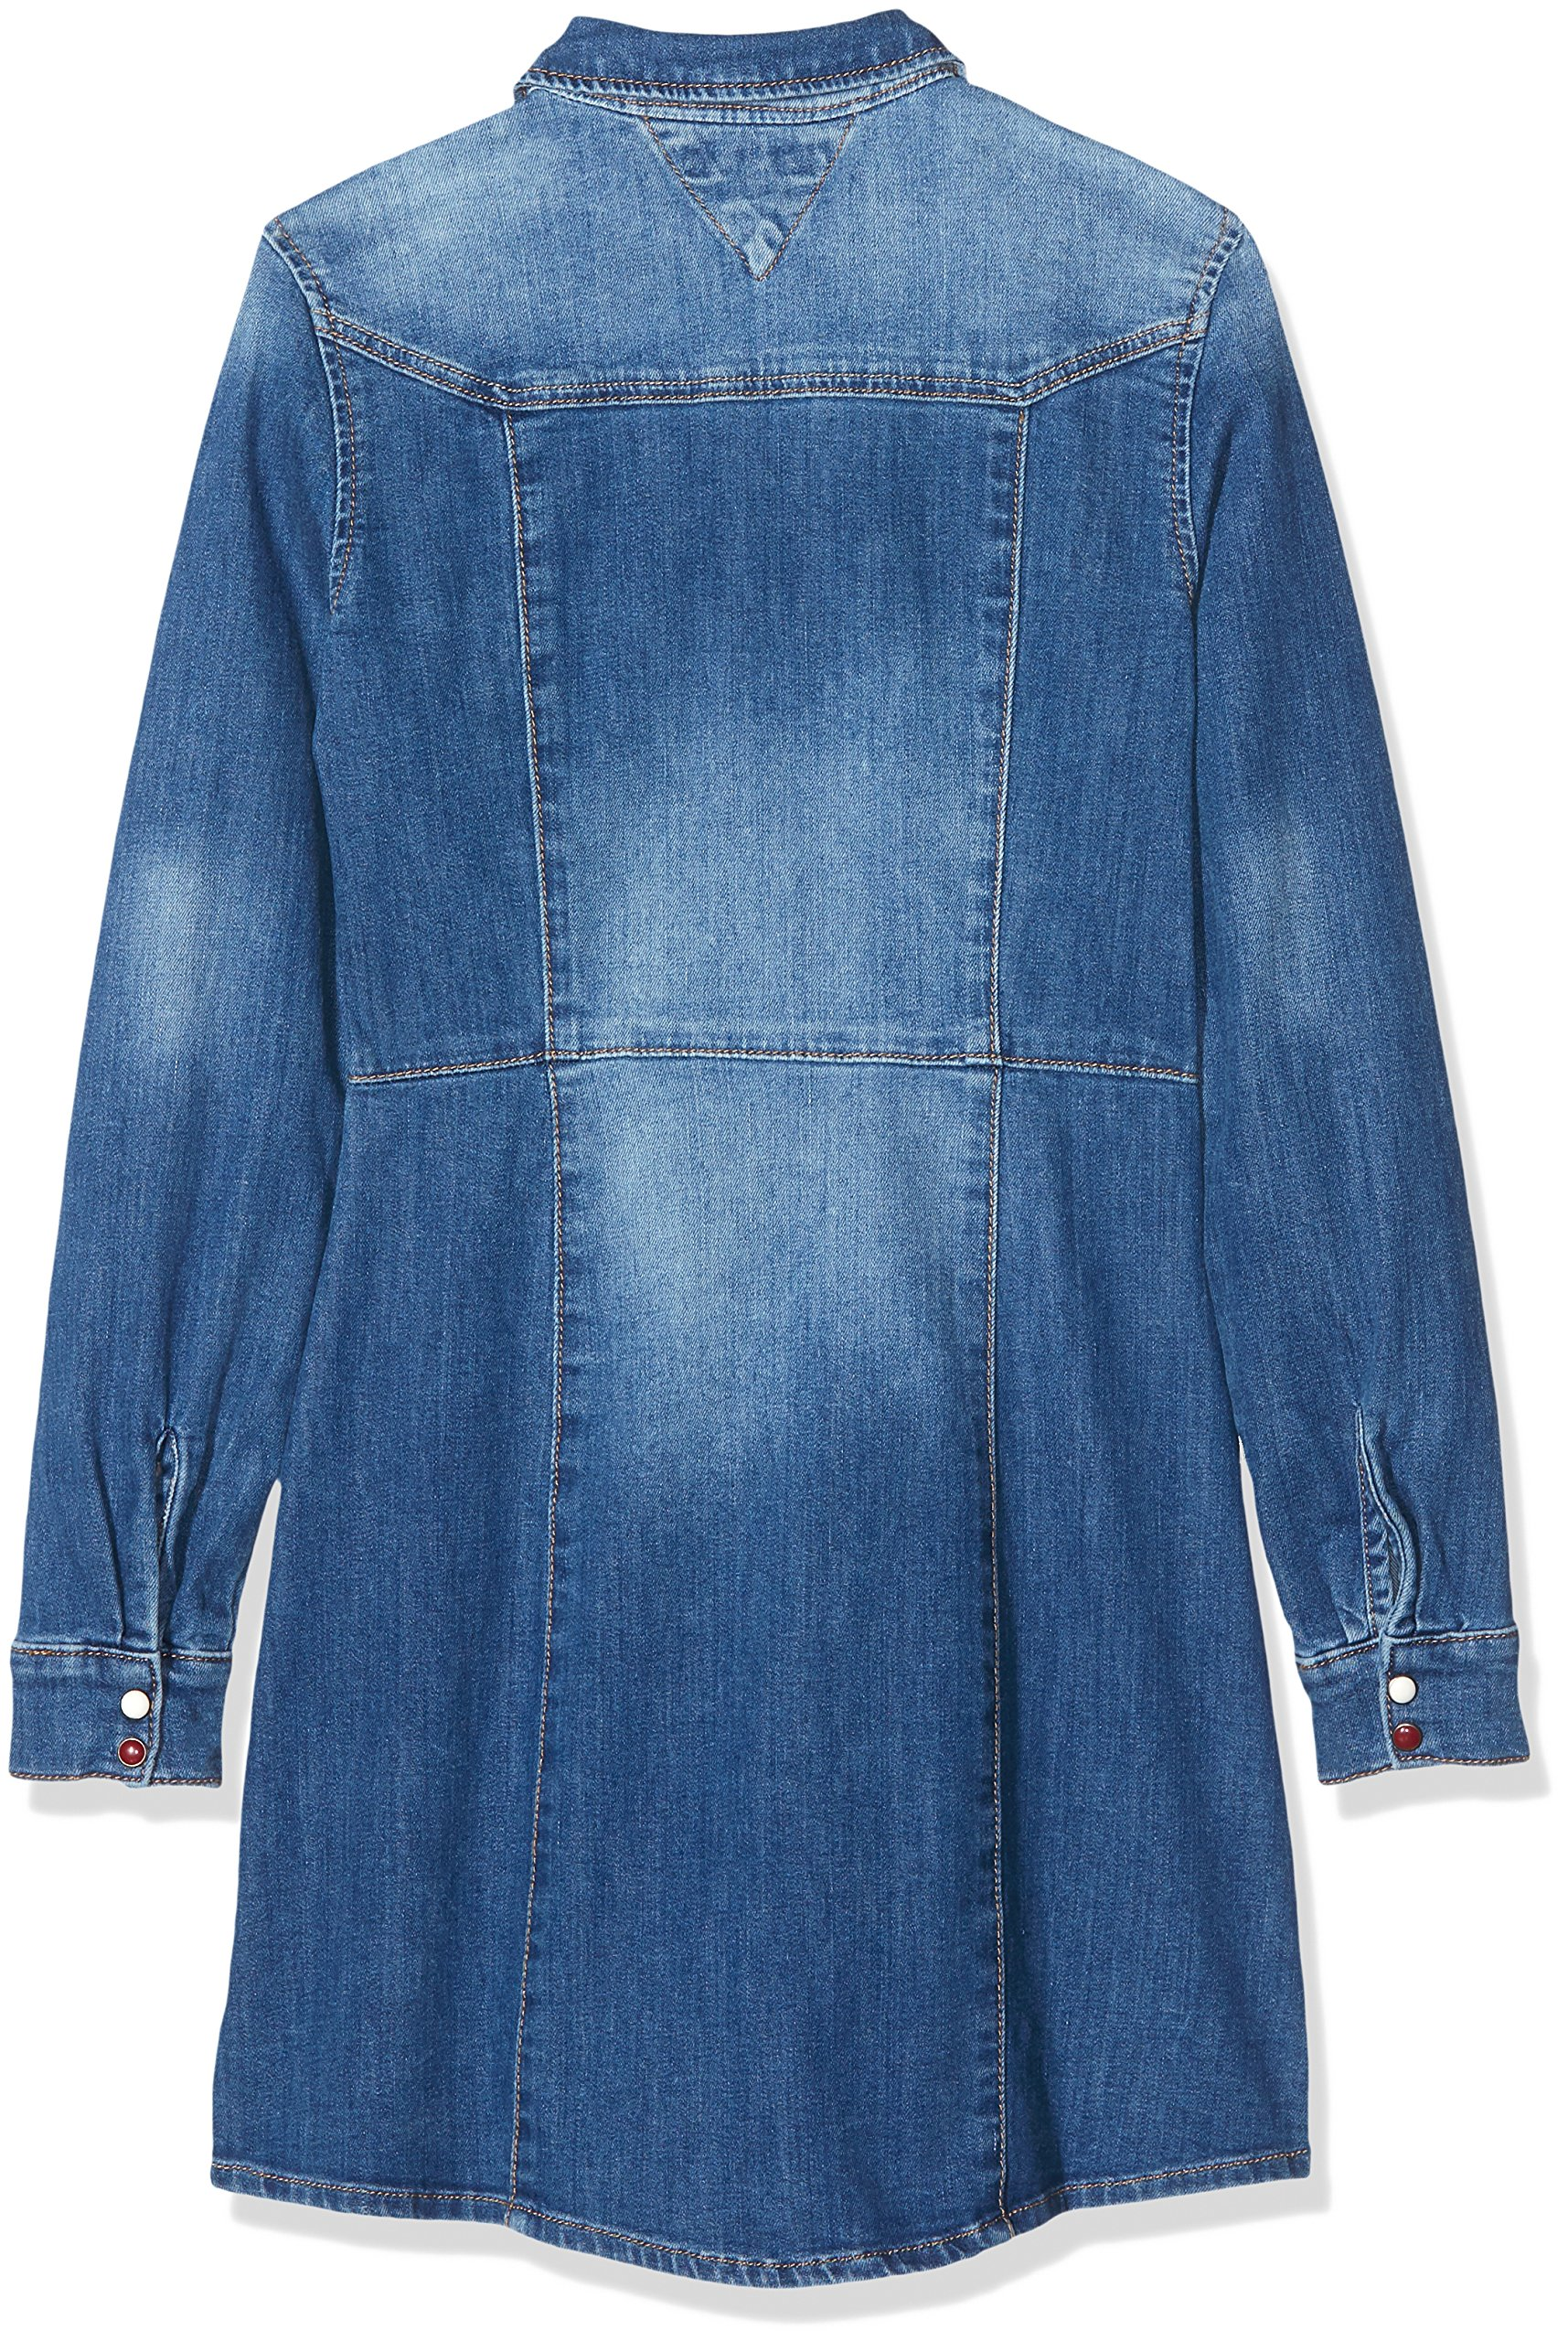 Tommy Hilfiger Denim Shirt Dress Dbstr suéter para Mujer